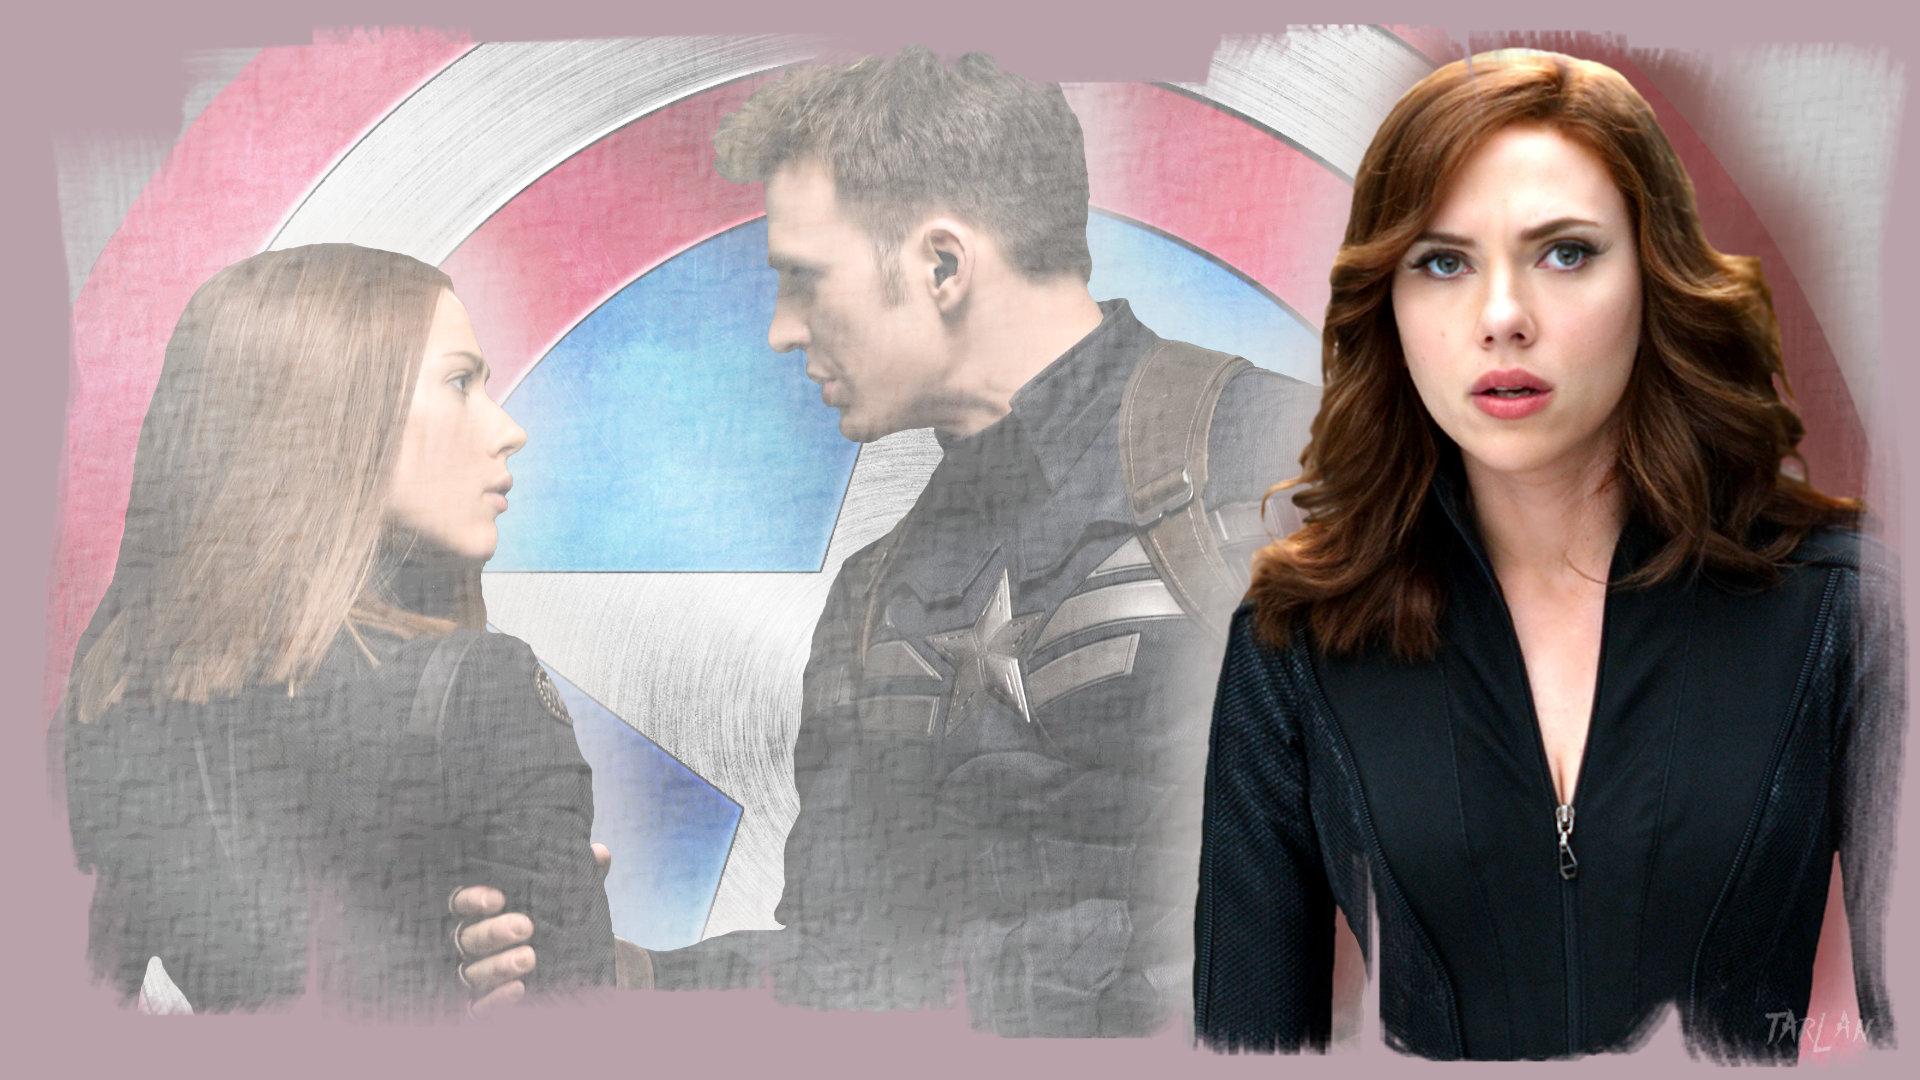 Avengers - Steve and Natasha by Tarlan